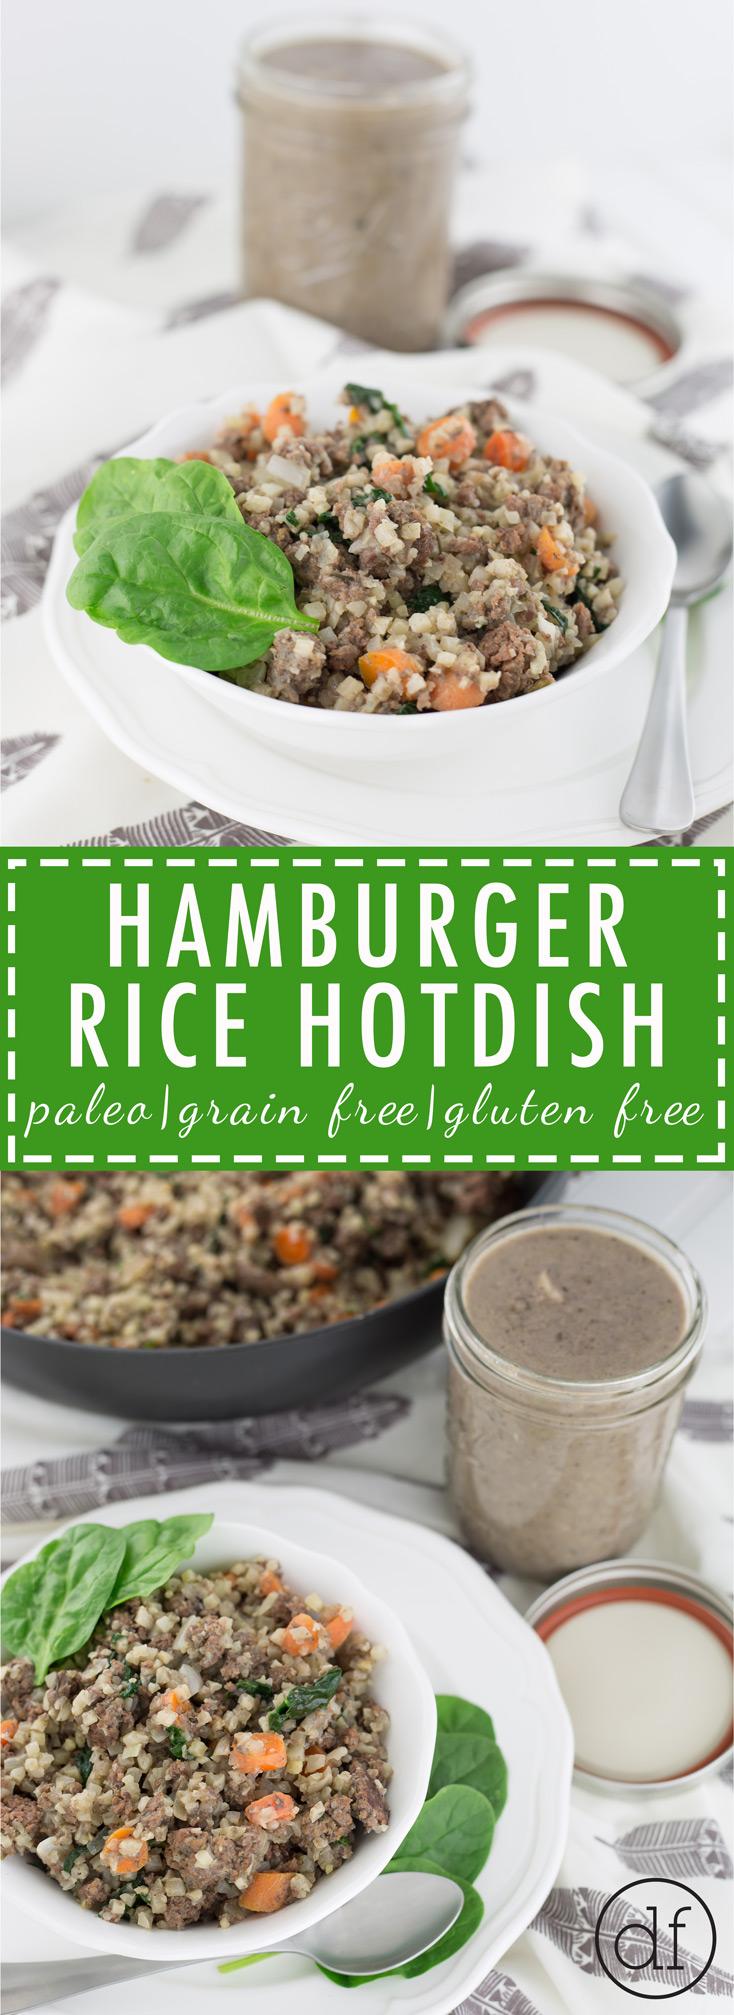 Hamburger Rice Hotdish, Healthy Hotdish, Healthy Recipes, Minnesota, Comfort Foods, Real Food, Gluten Free, Grain Free, Dairy Free, Paleo, Whole 30, Healthy Meals, Cauliflower Rice,